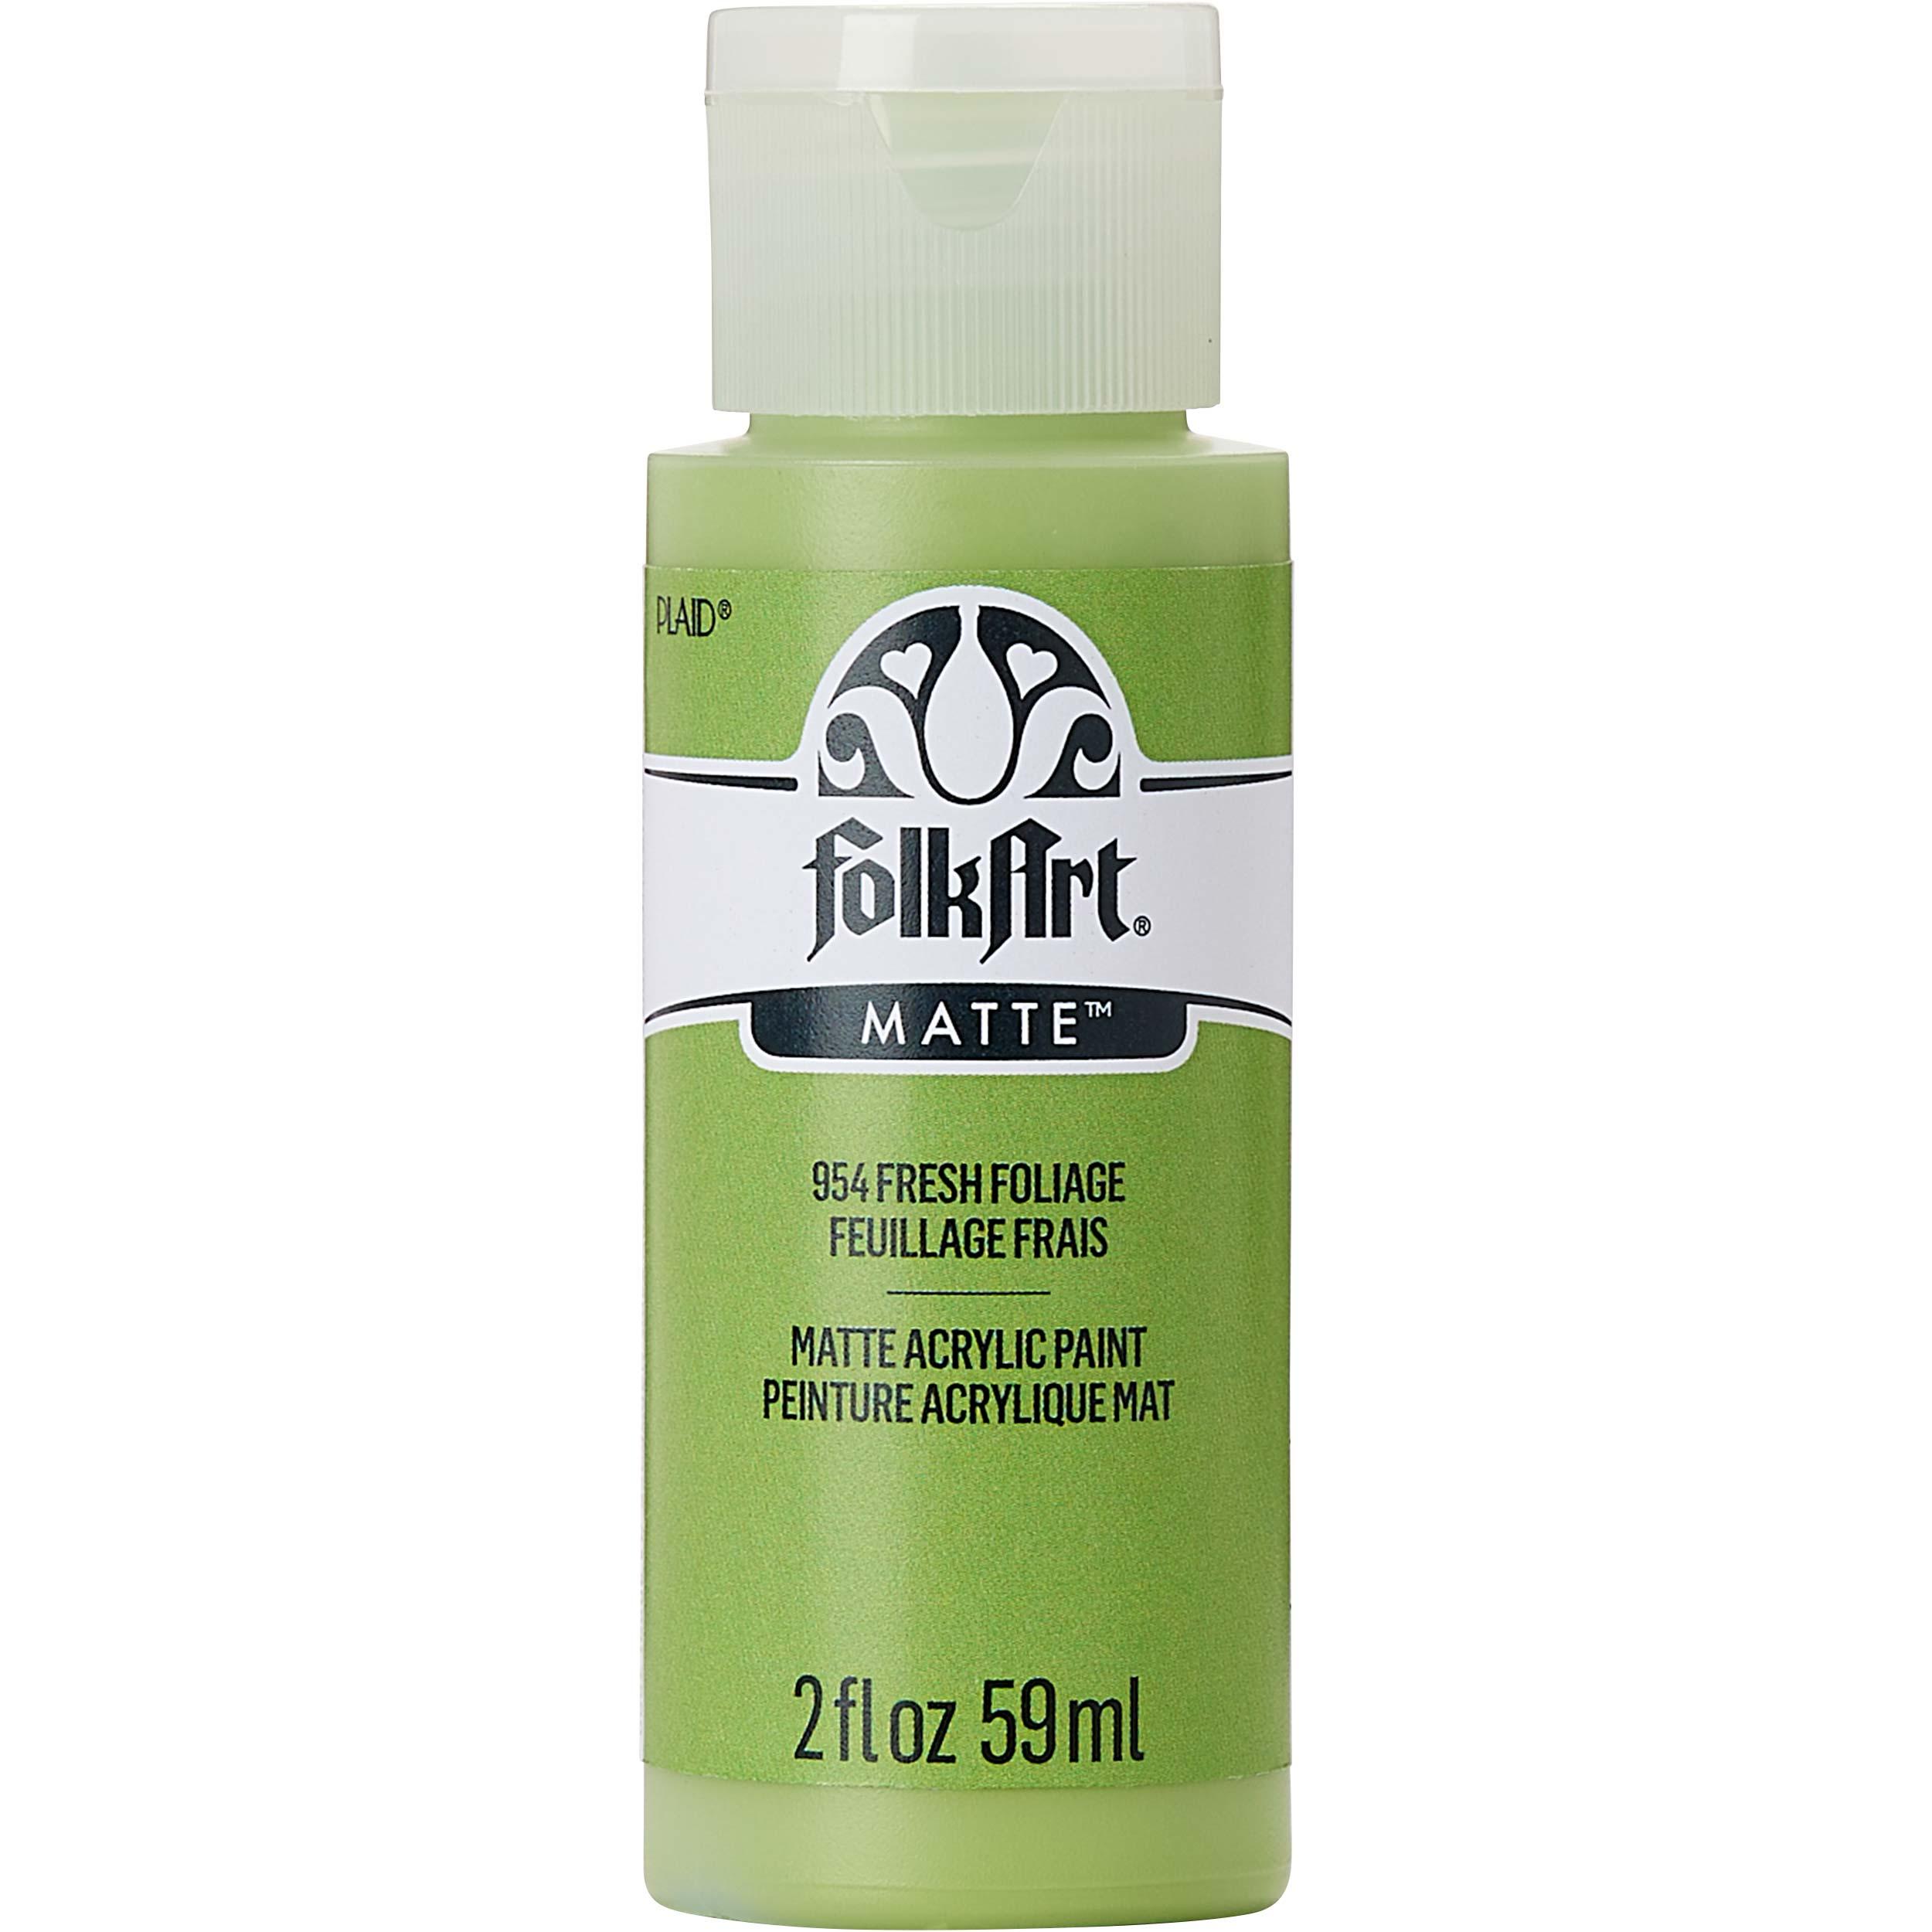 FolkArt ® Acrylic Colors - Fresh Foliage, 2 oz. - 954